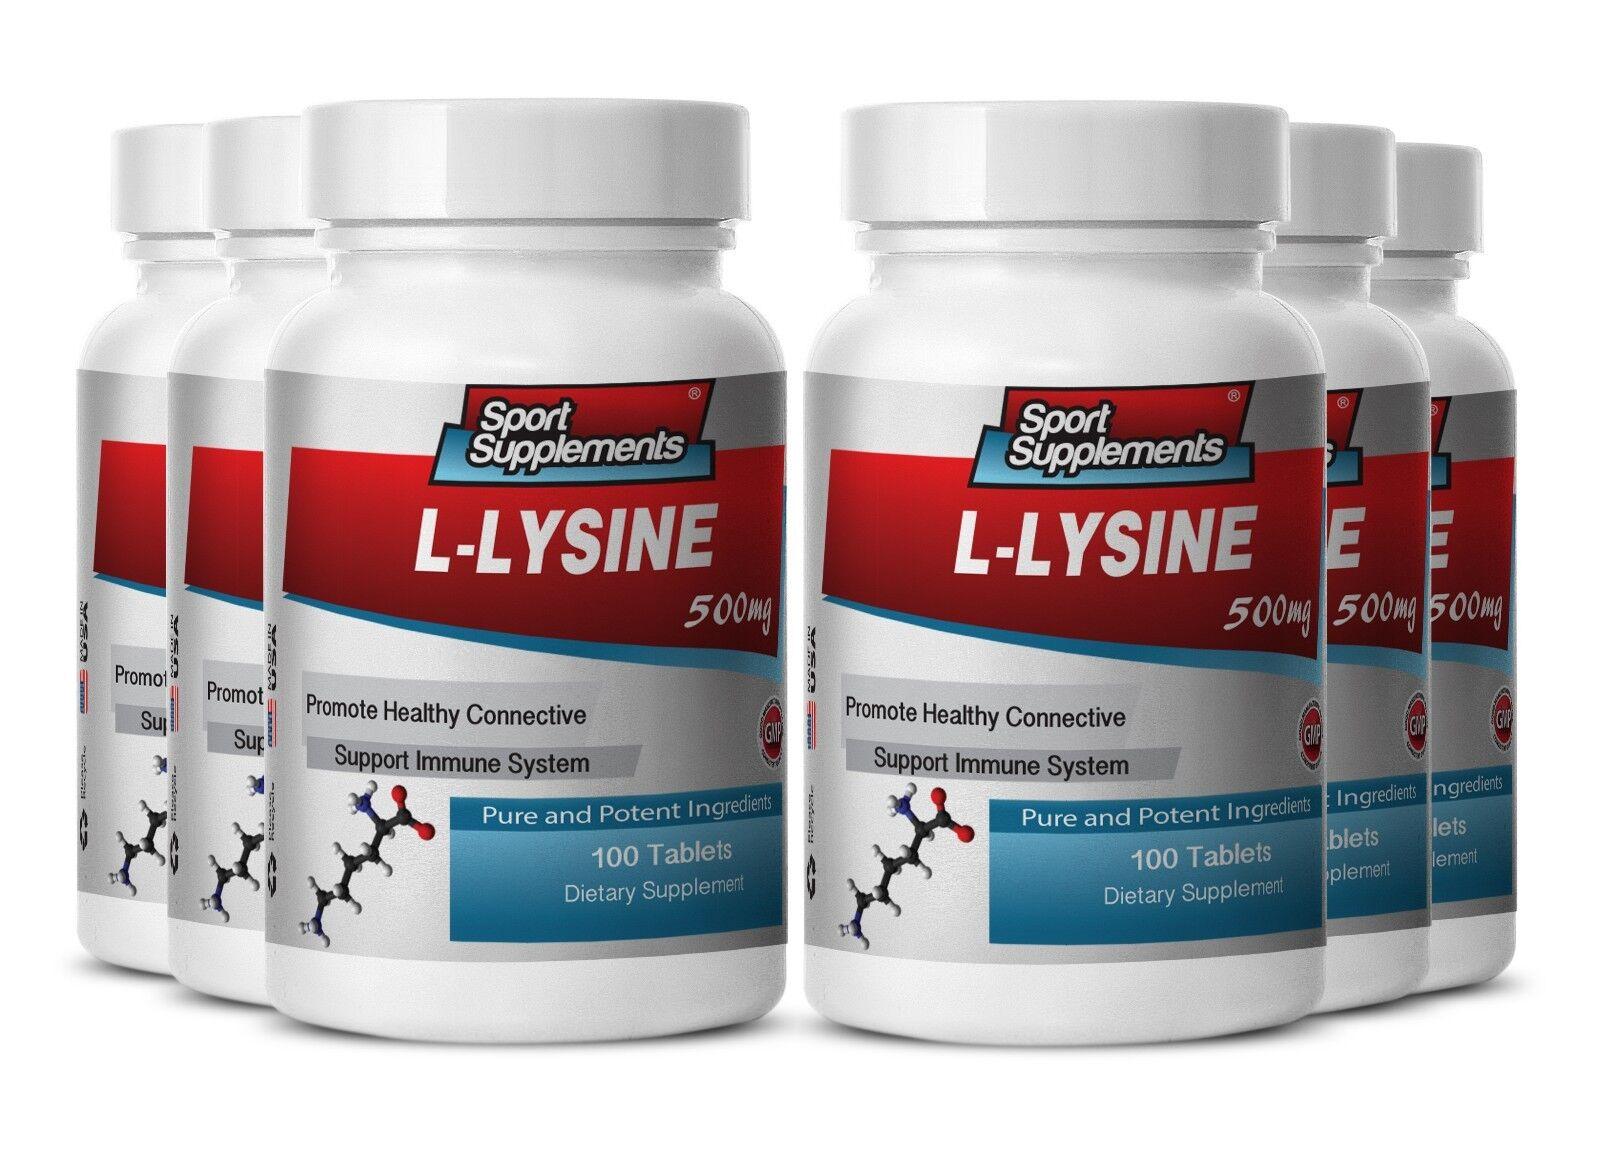 L-Lysine Tablet - - L-Lysine 500mg - - Supreme Weight Loss Supplements 6B 346761